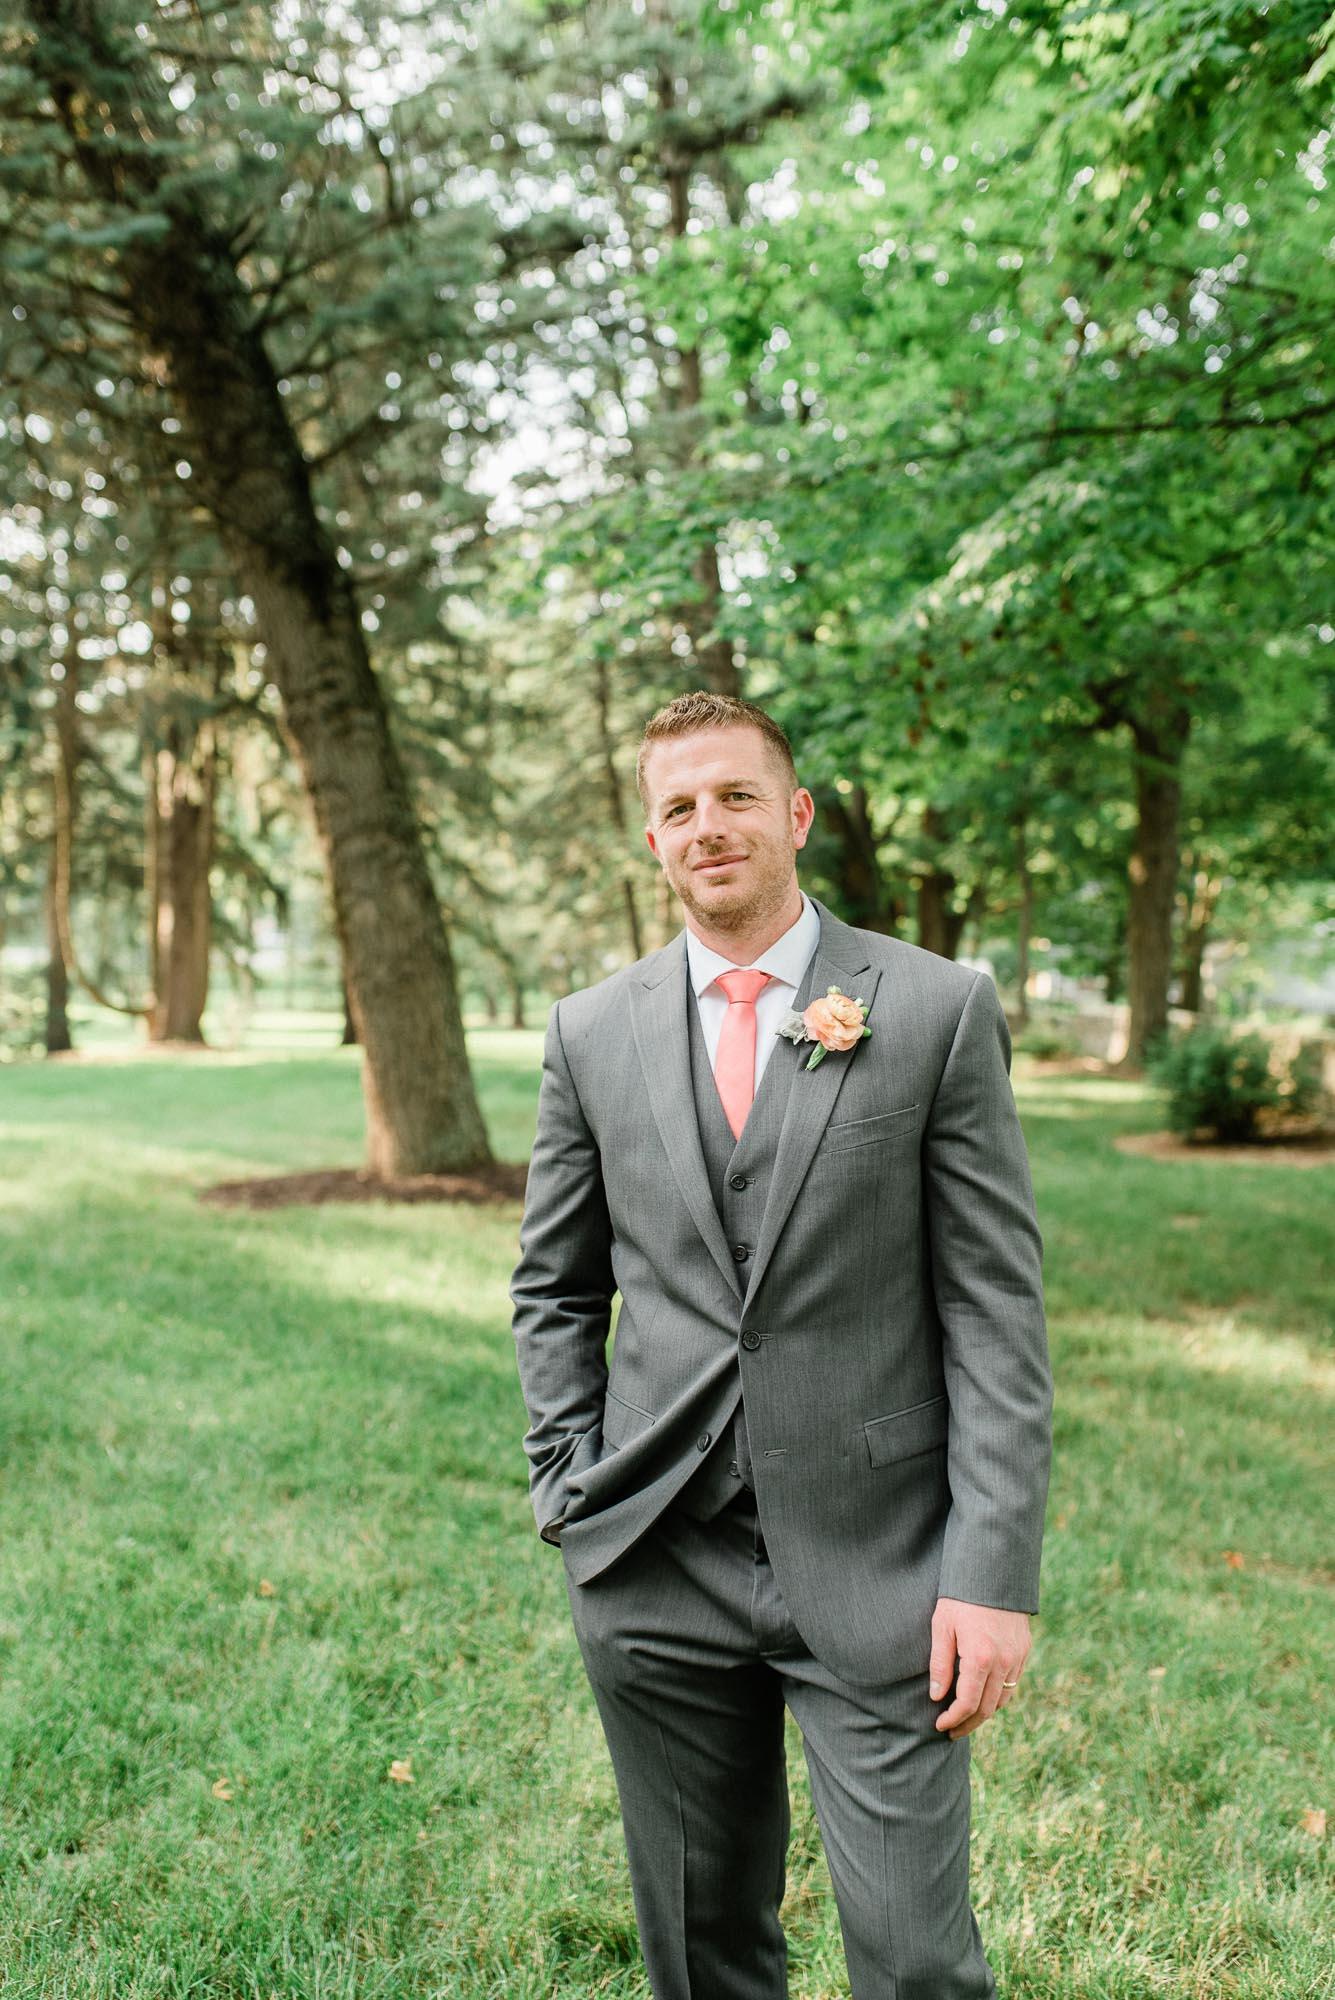 Allenberry-resort-historic-pennsylvania-wedding-1624.jpg